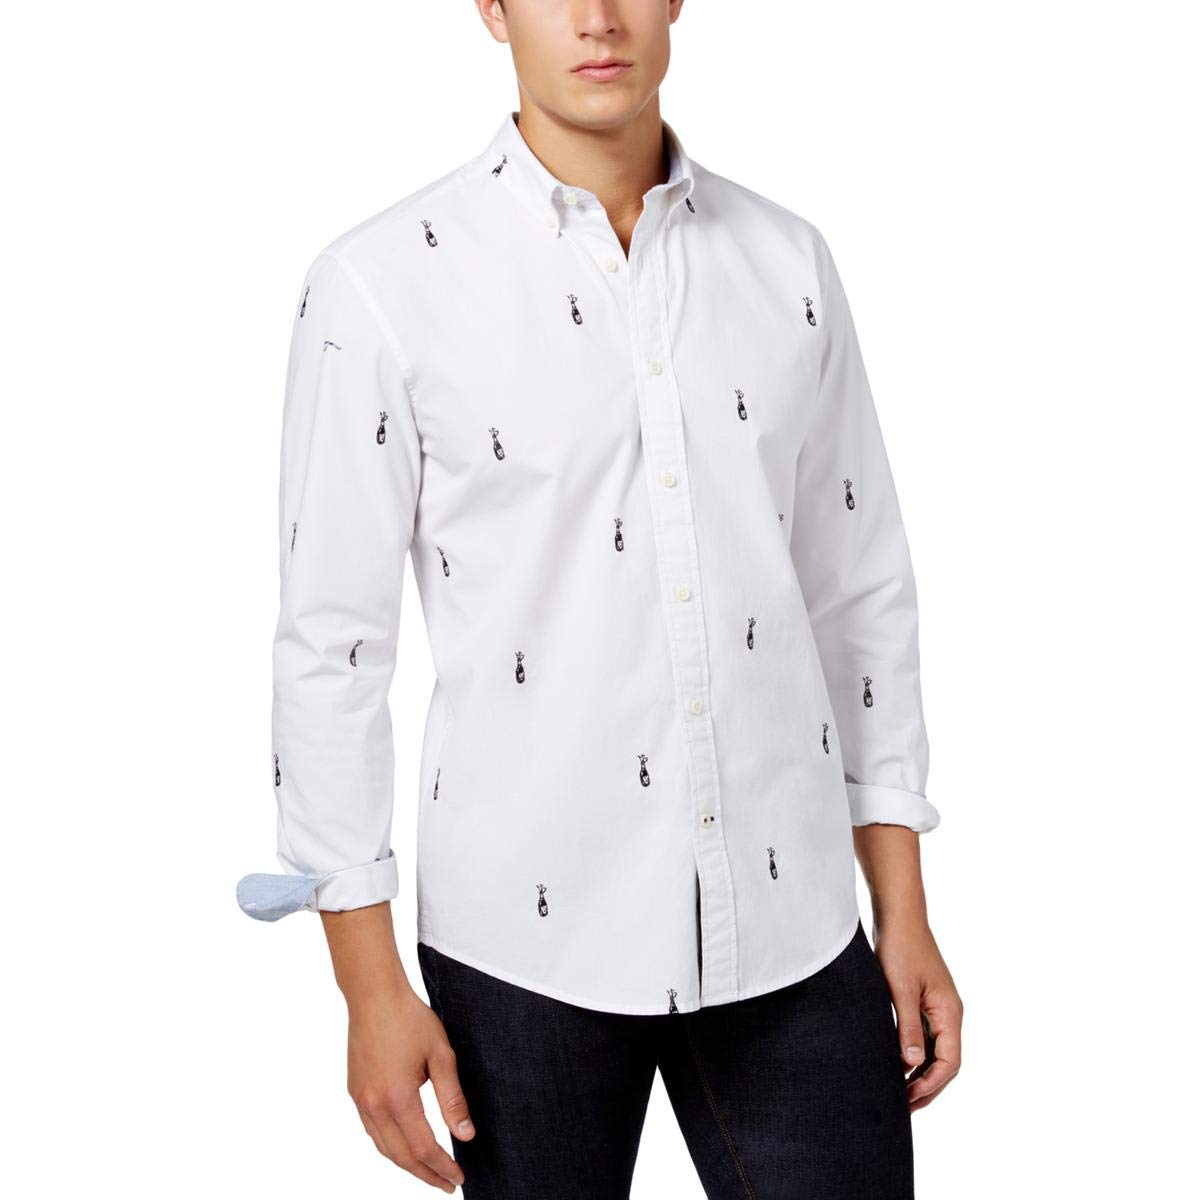 Amazon.com: Tommy Hilfiger - Camiseta de manga ajustable ...